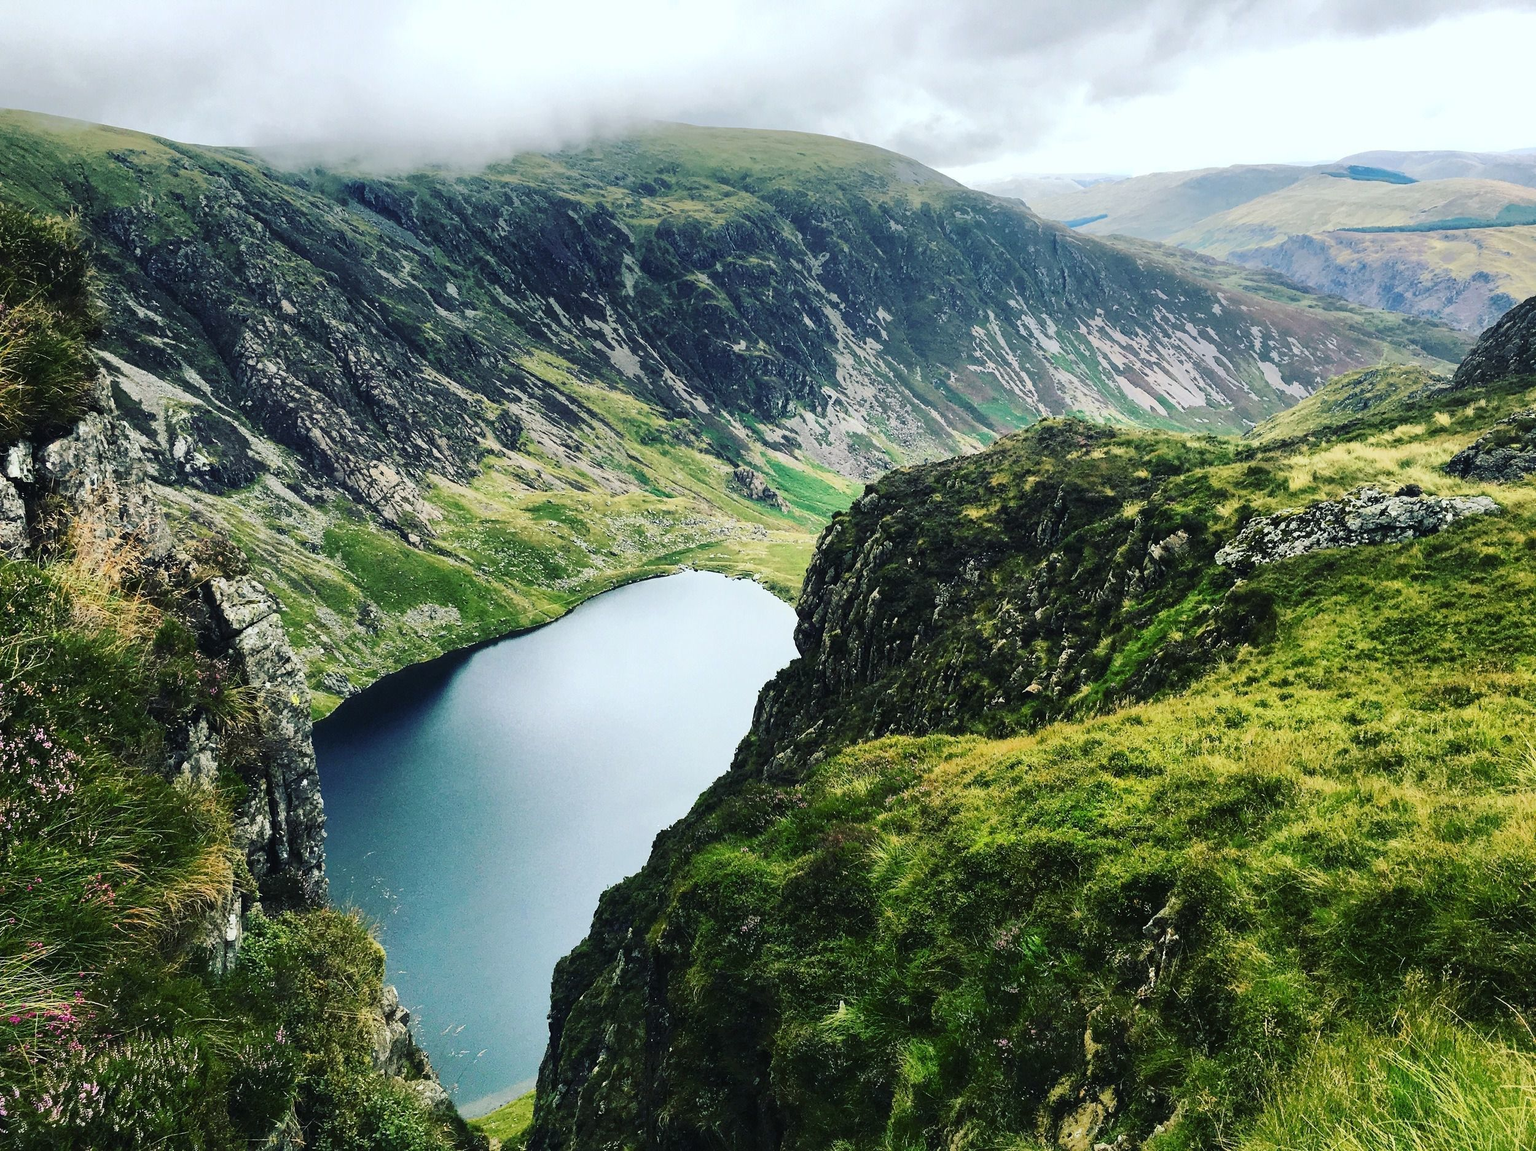 trekking in wales